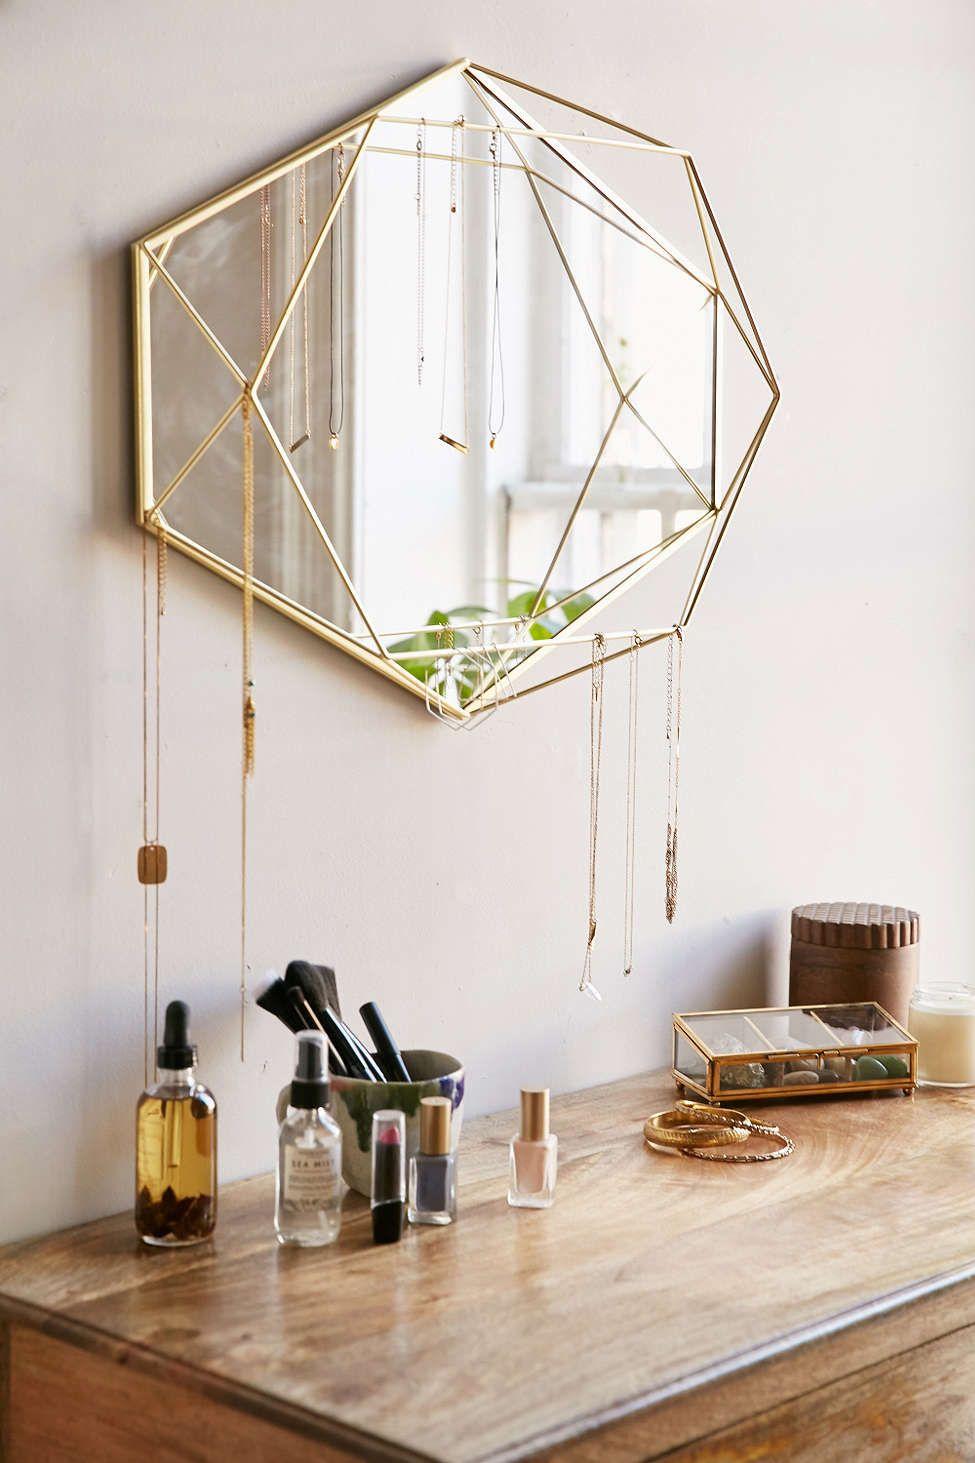 miroir prisme umbra chambre pinterest miroirs. Black Bedroom Furniture Sets. Home Design Ideas